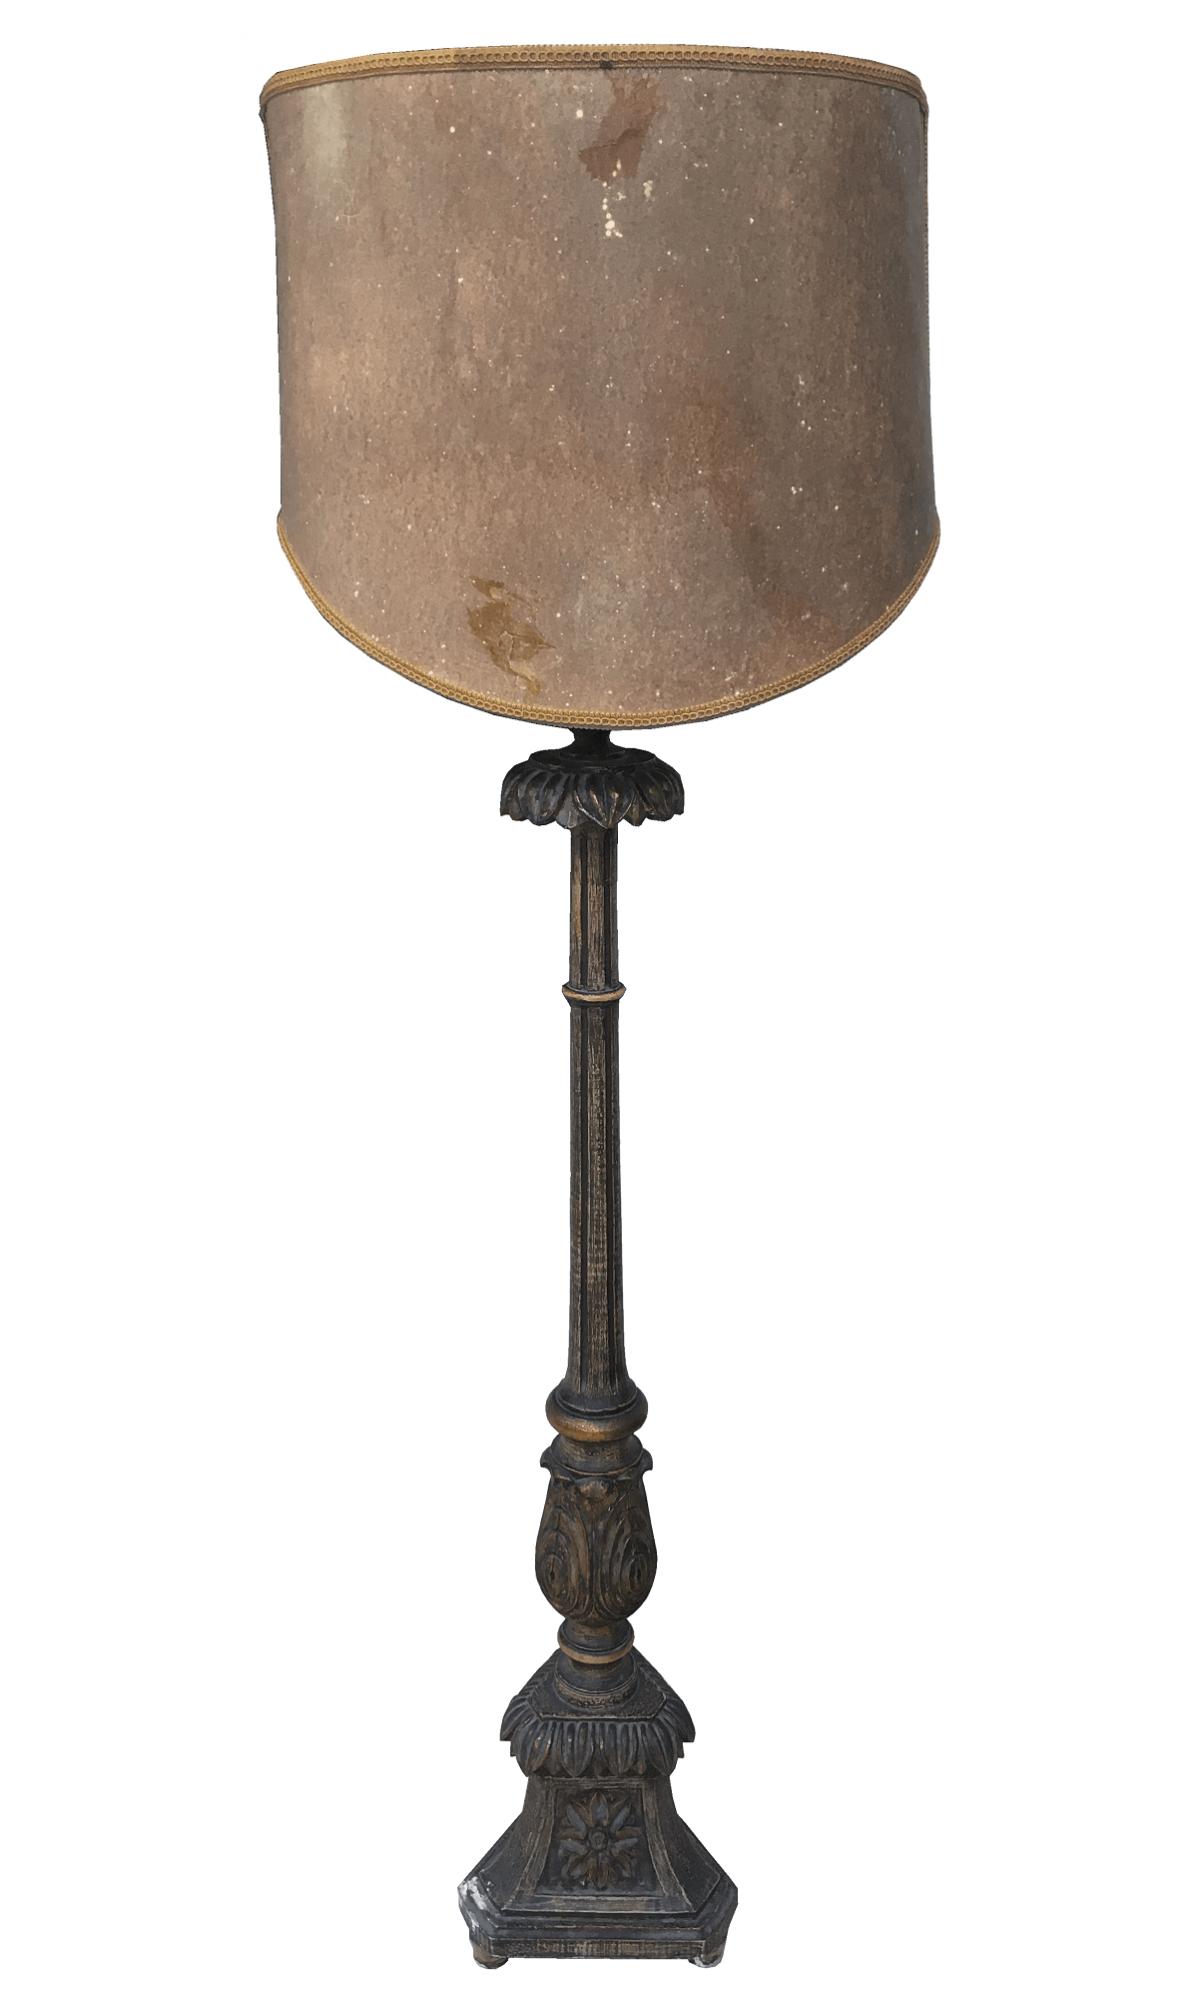 Abajur Tocheiro Madeira Antigo Pedestal Barroco